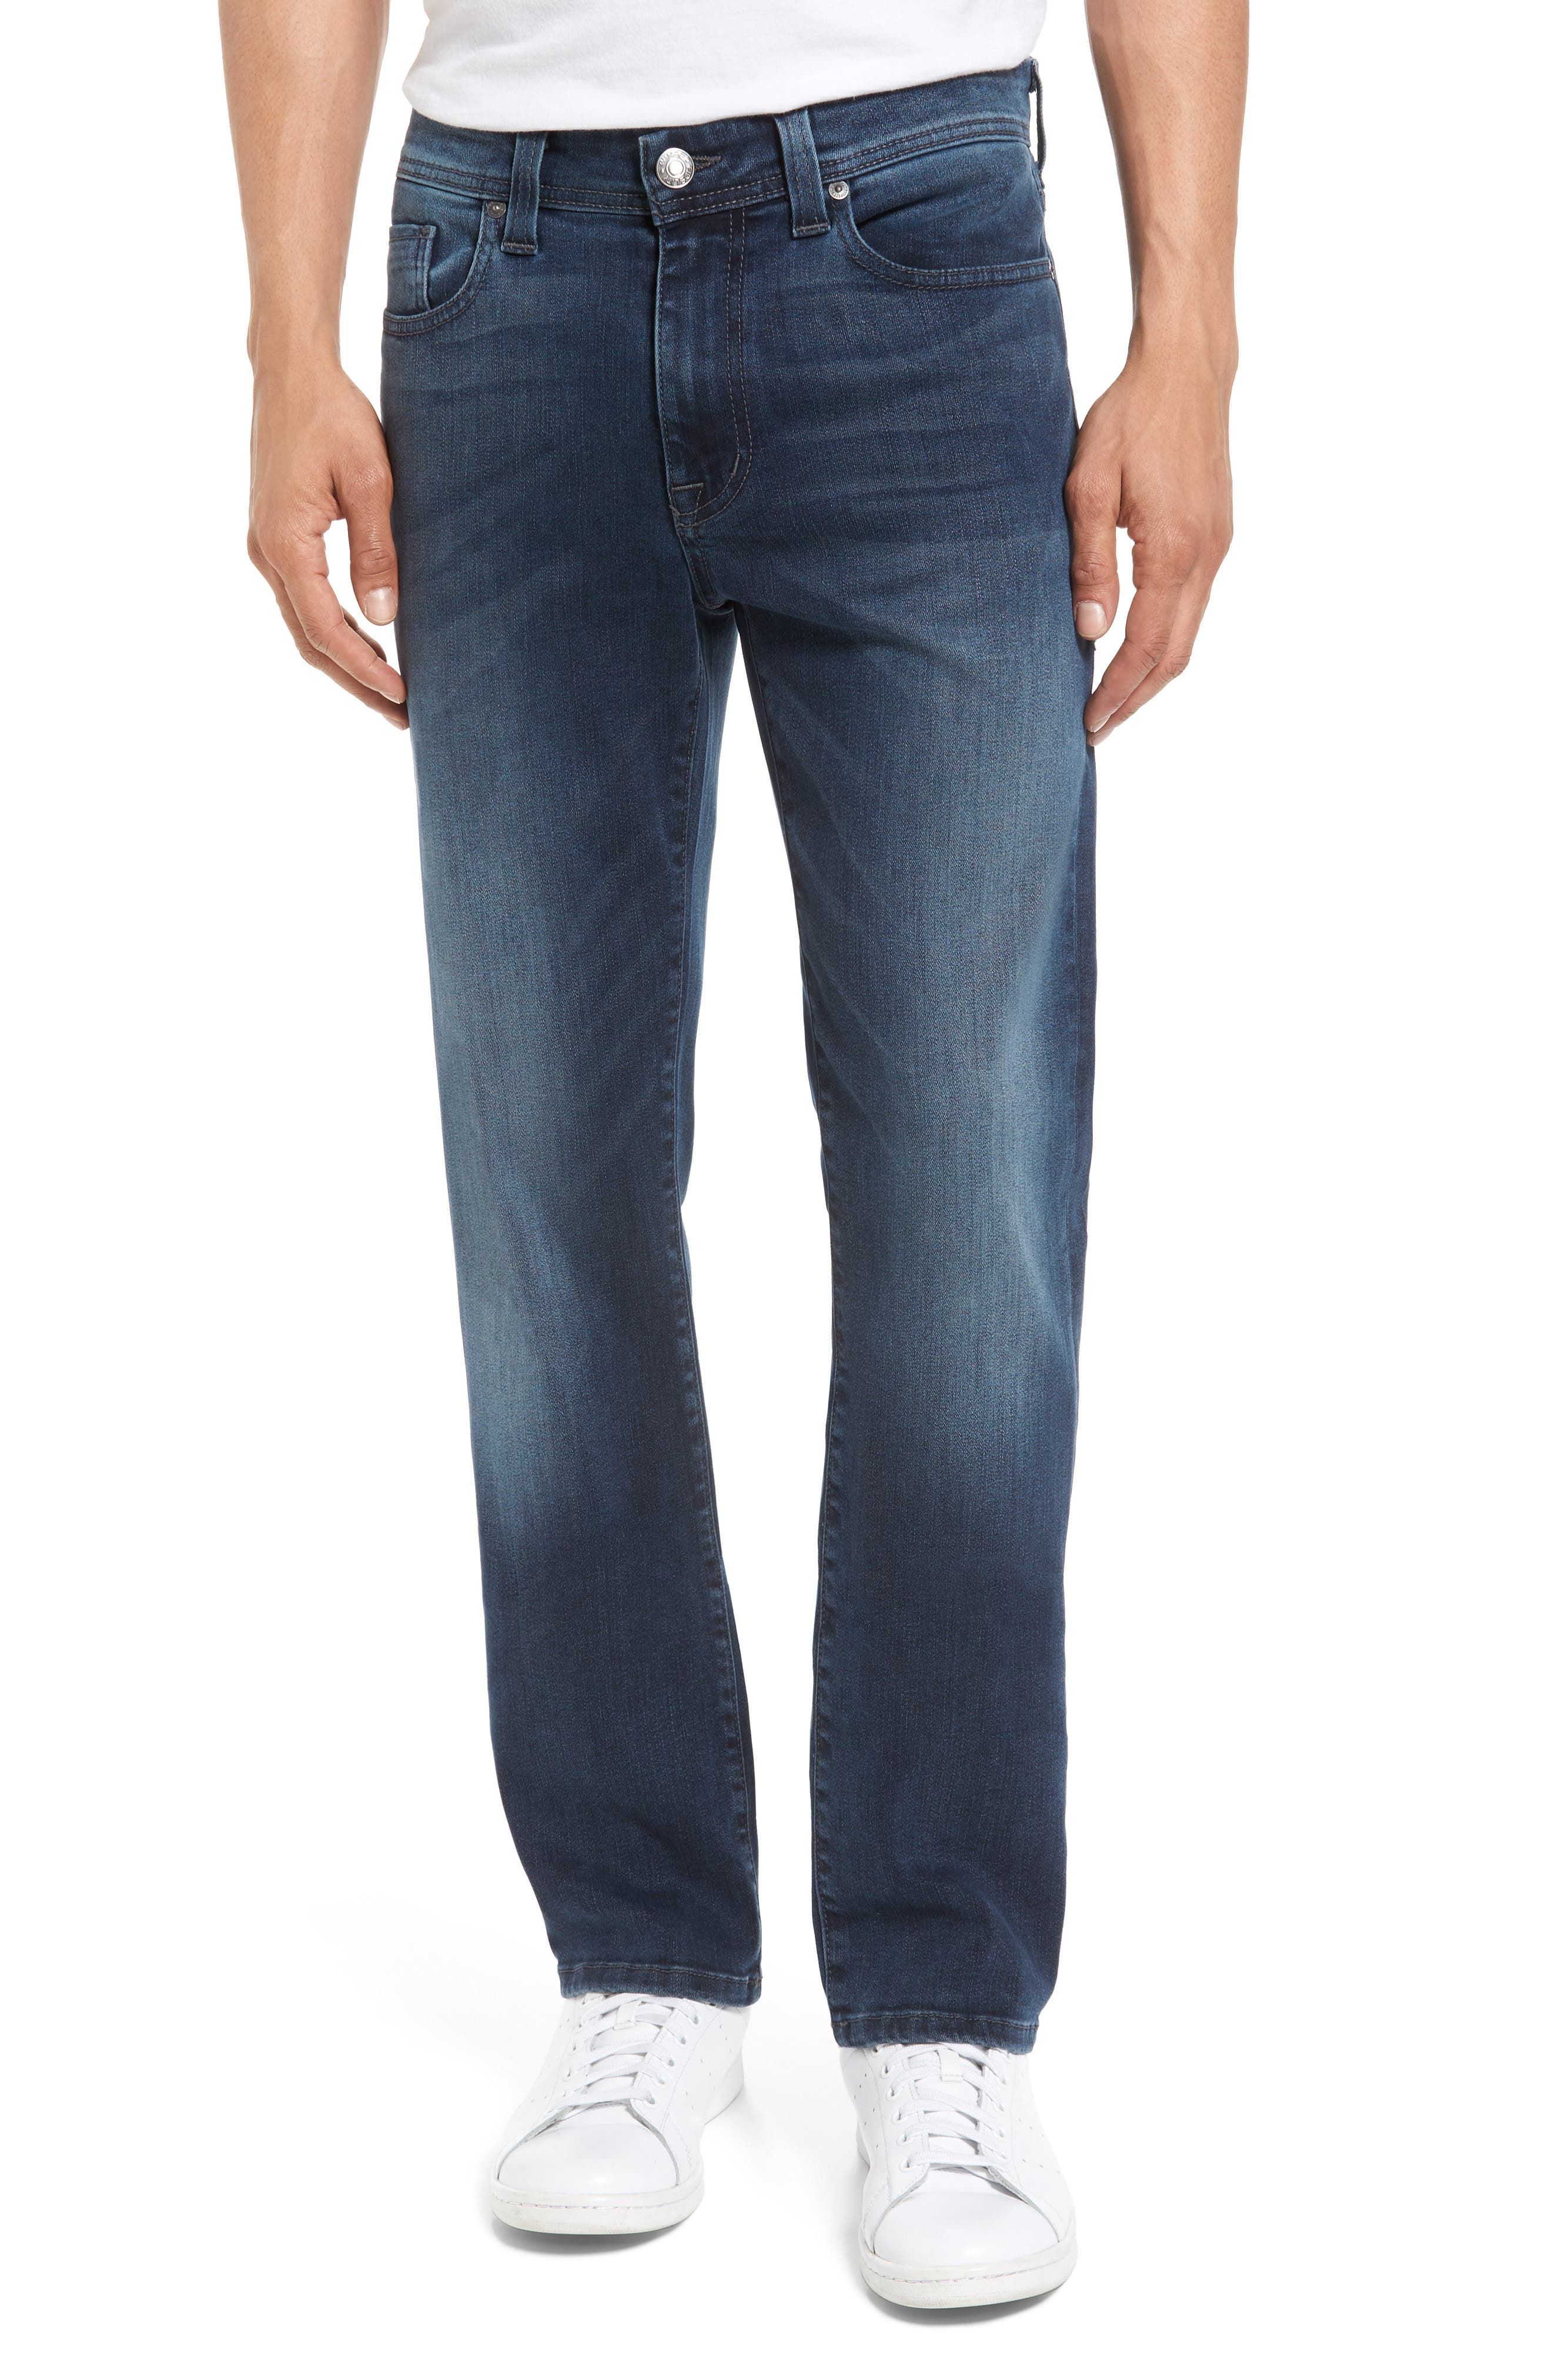 FIDELITY DENIM Fidelity Jimmy Slim Straight Leg Jeans